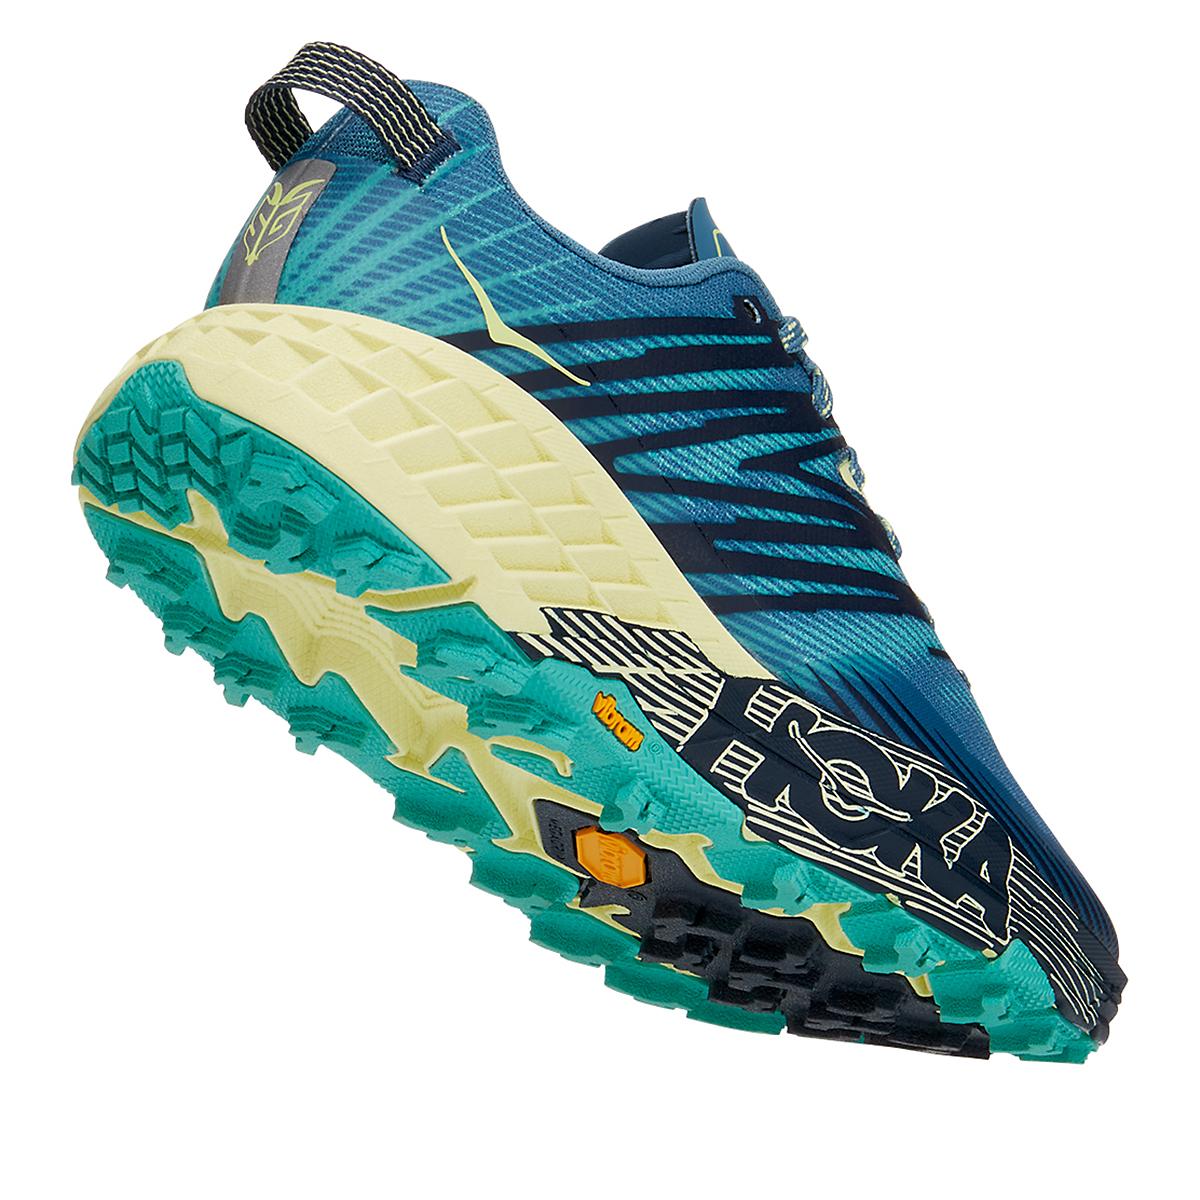 Women's Hoka One One Speedgoat 4 Trail Running Shoe, , large, image 6